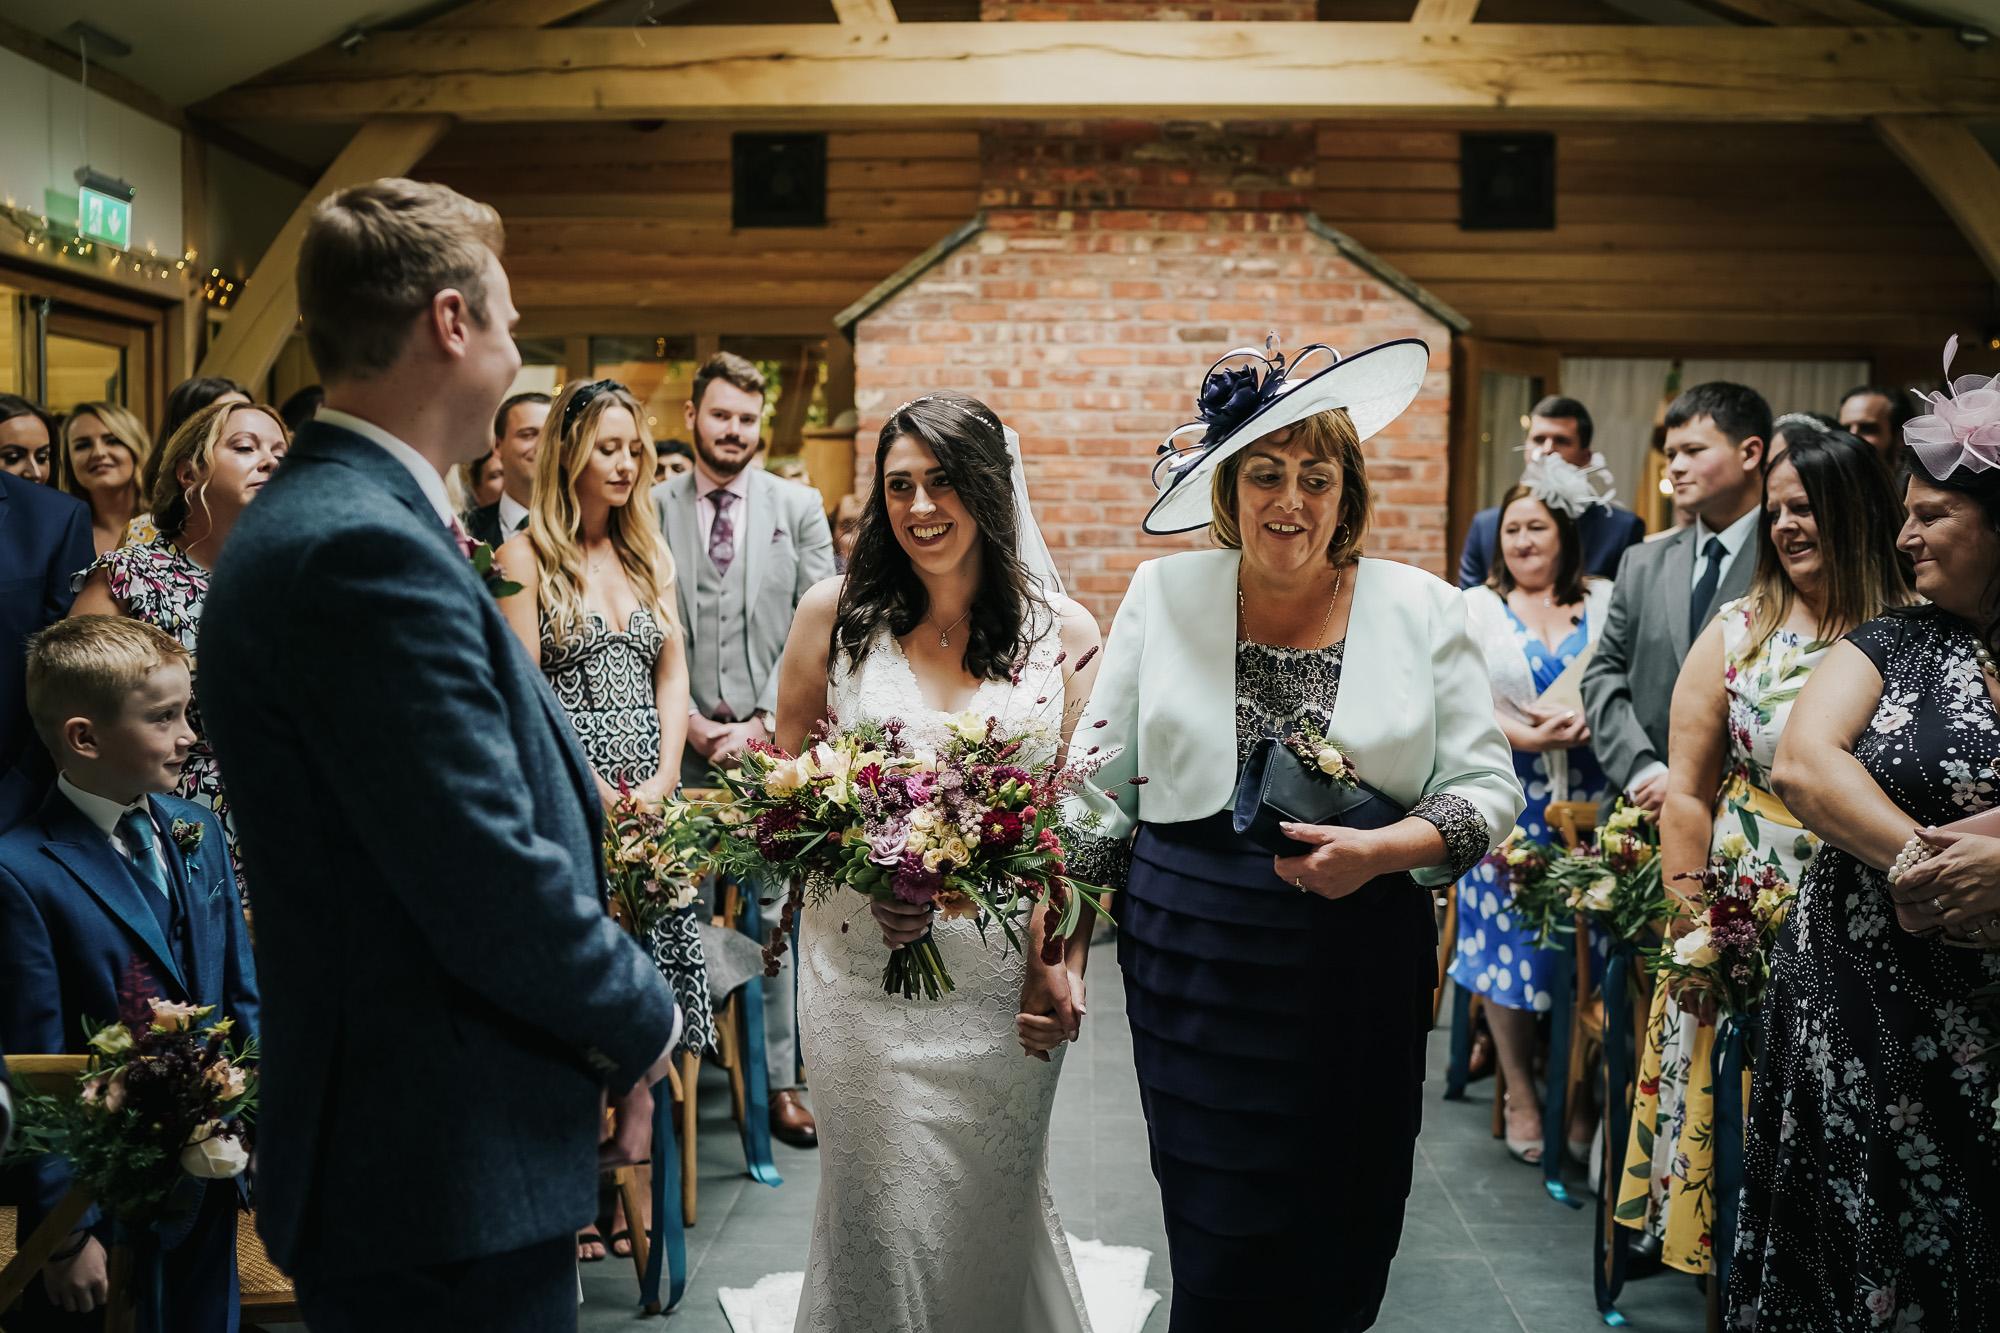 Oak tree of peover wedding photography cheshire wedding photographer (15 of 56).jpg